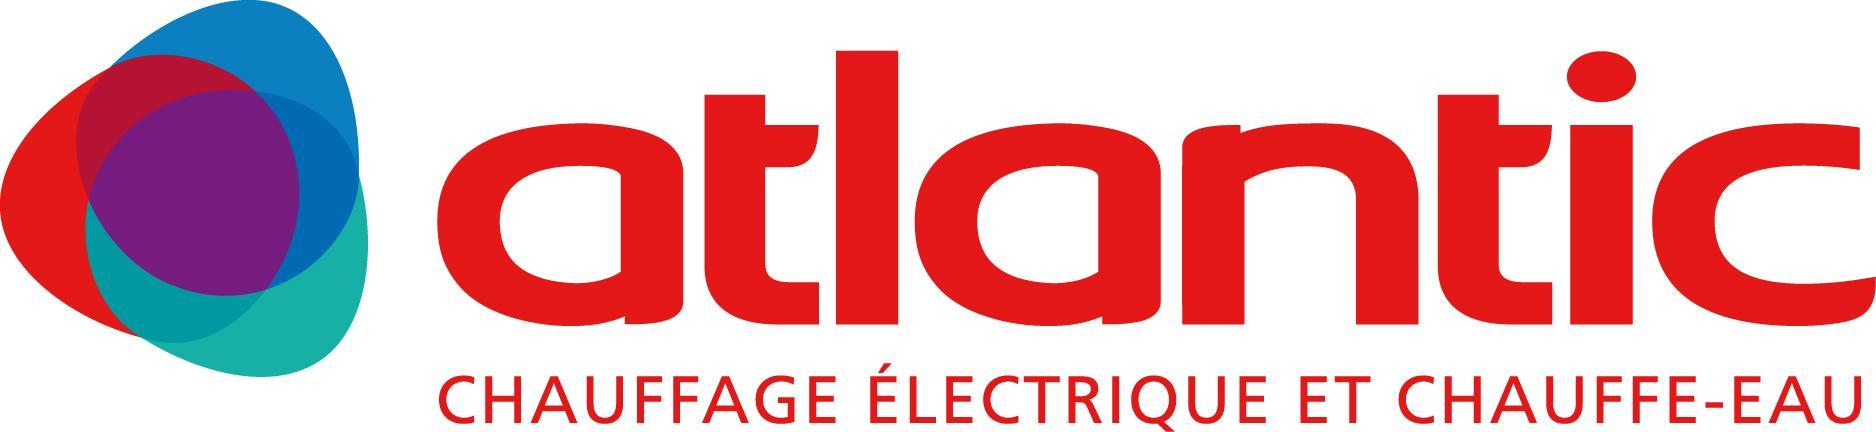 Atlantic chauffage logo